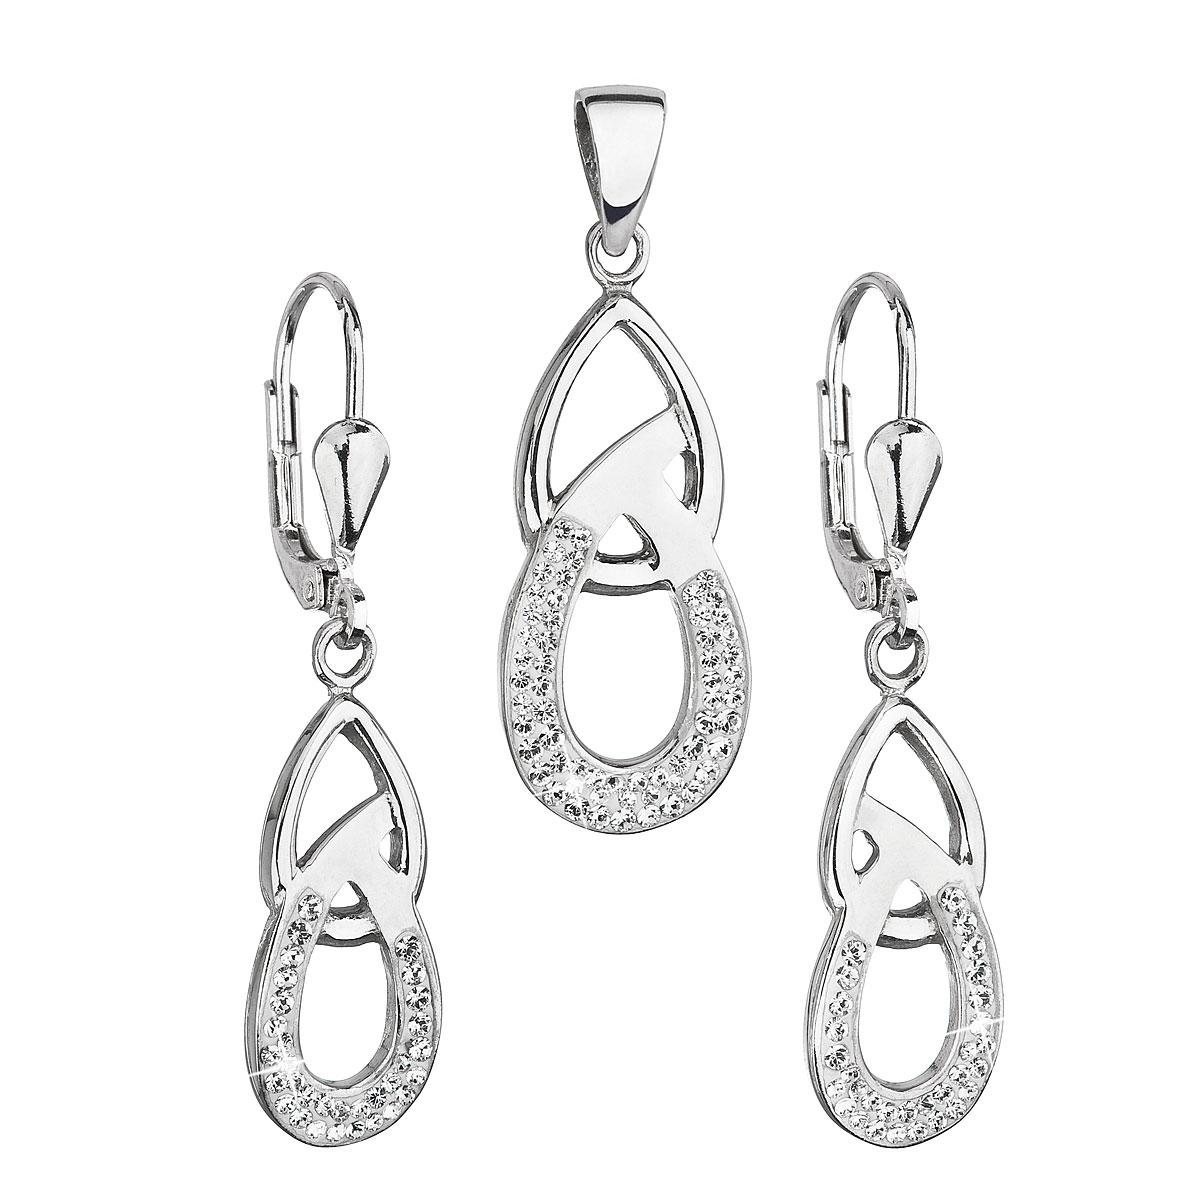 Souprava stříbrných šperků s krystaly Crystals from Swarovski® Crystal